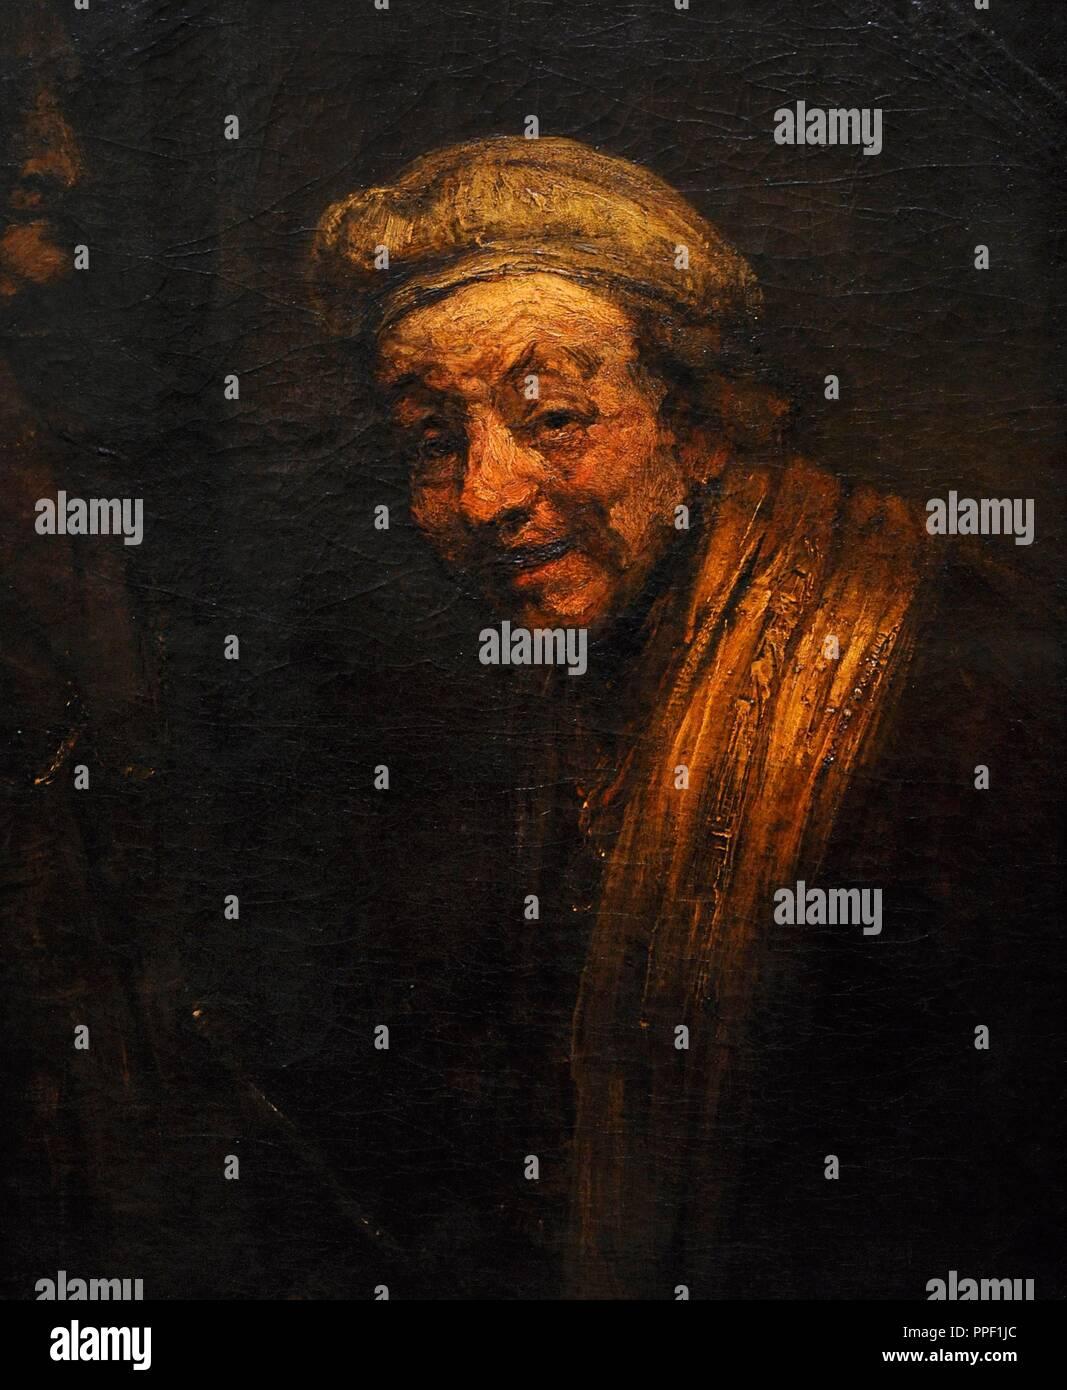 Rembrandt, Rembrandt Harmensz van Rijn, called (1606-1669). Dutch painter and printmaker. Self-portrait, 1632-1633. Wallraf-Richartz Museum. Cologne. Germany. - Stock Image